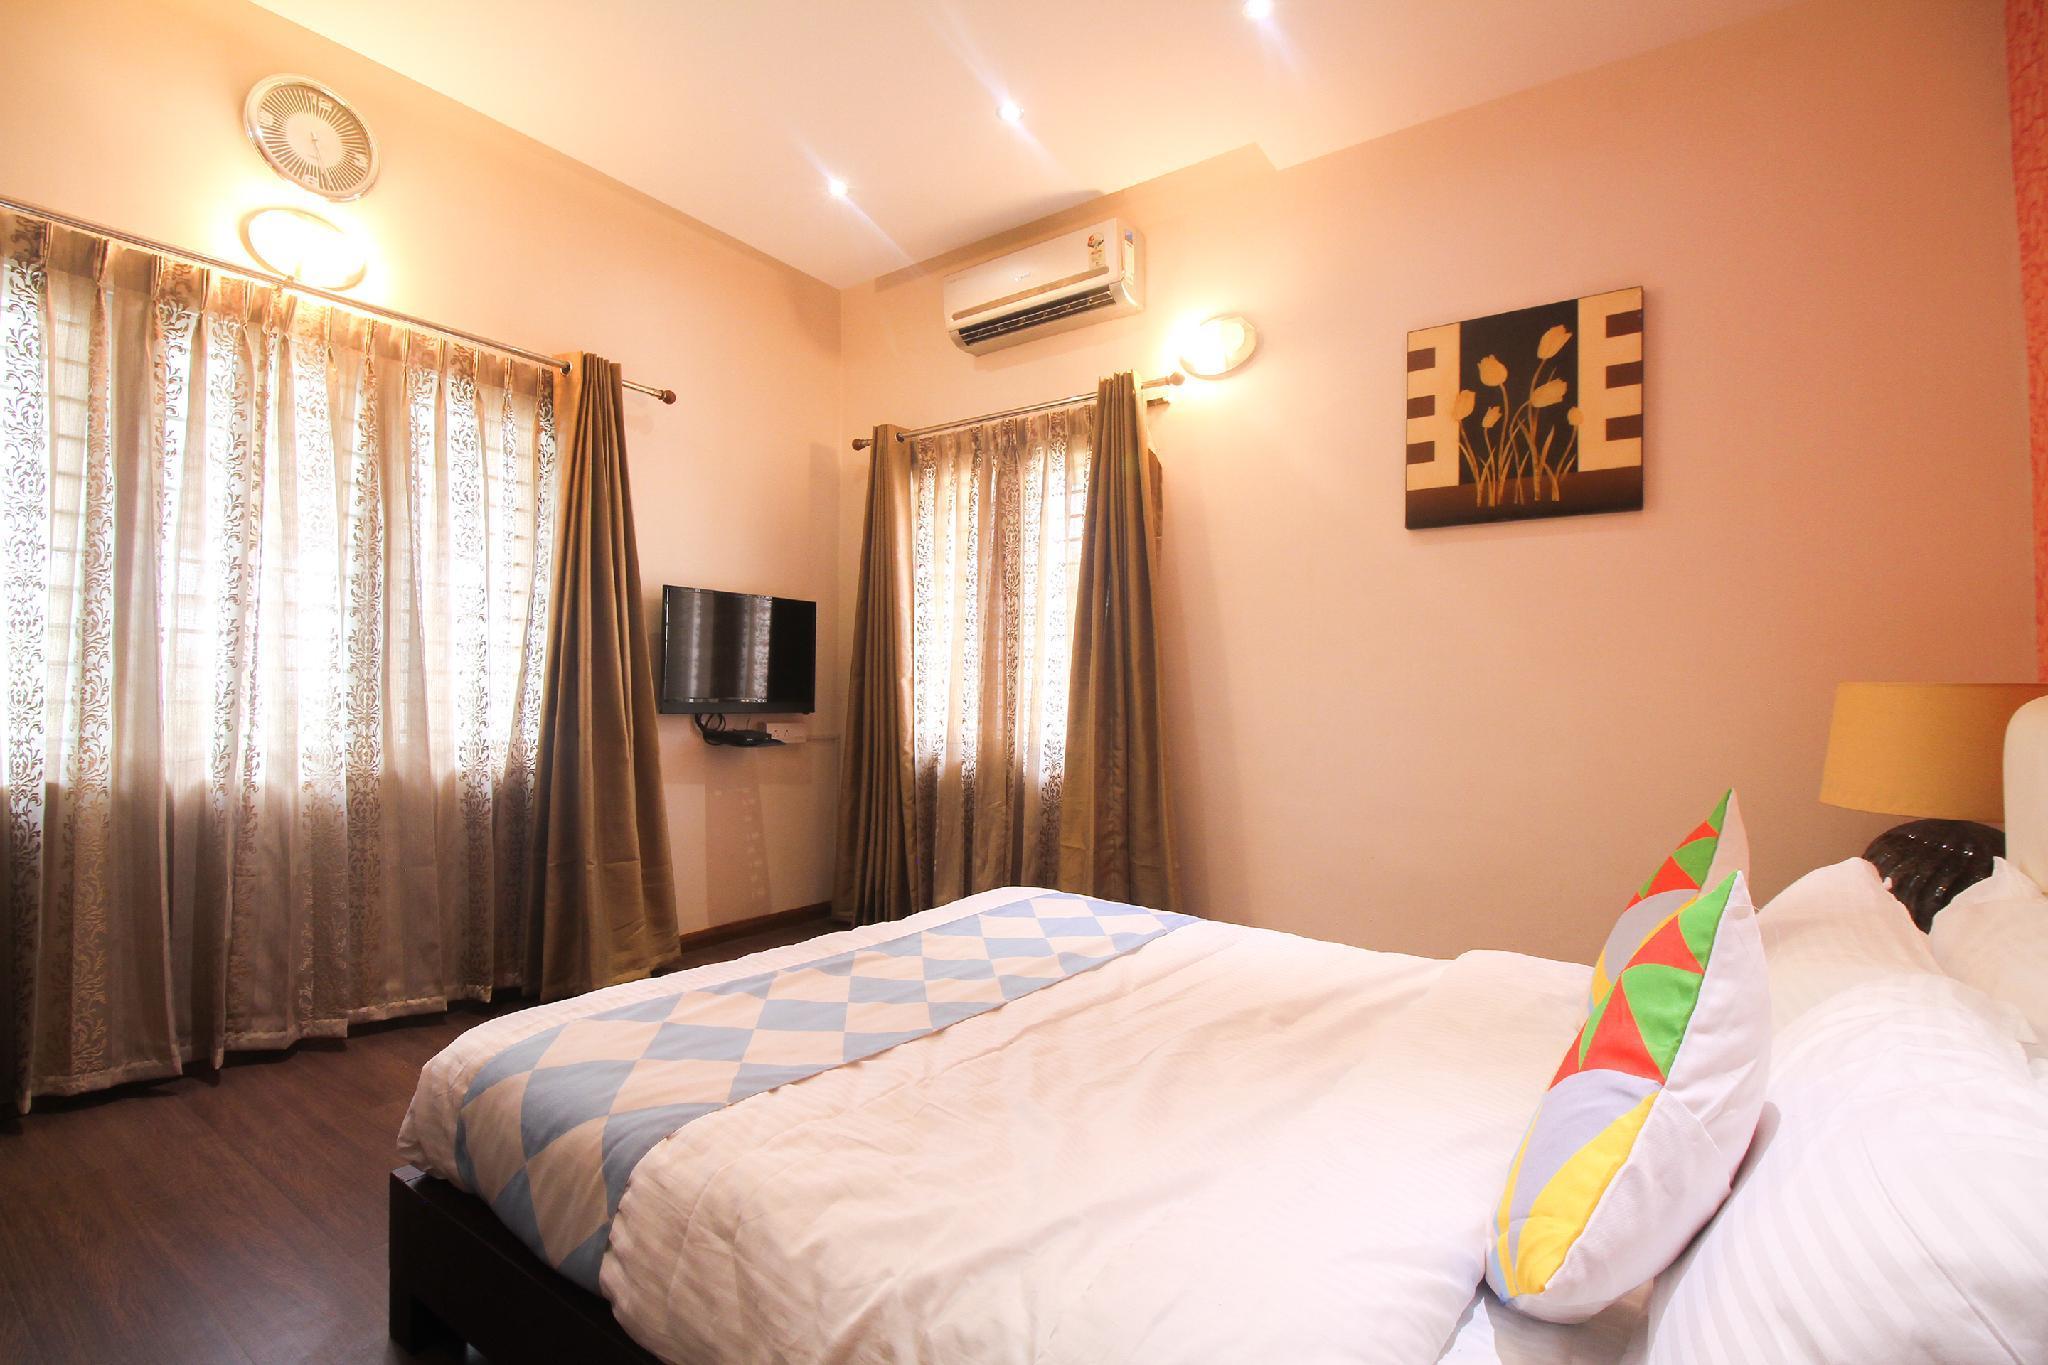 OYO 39730 Luxury Holiday Rental In Calicut